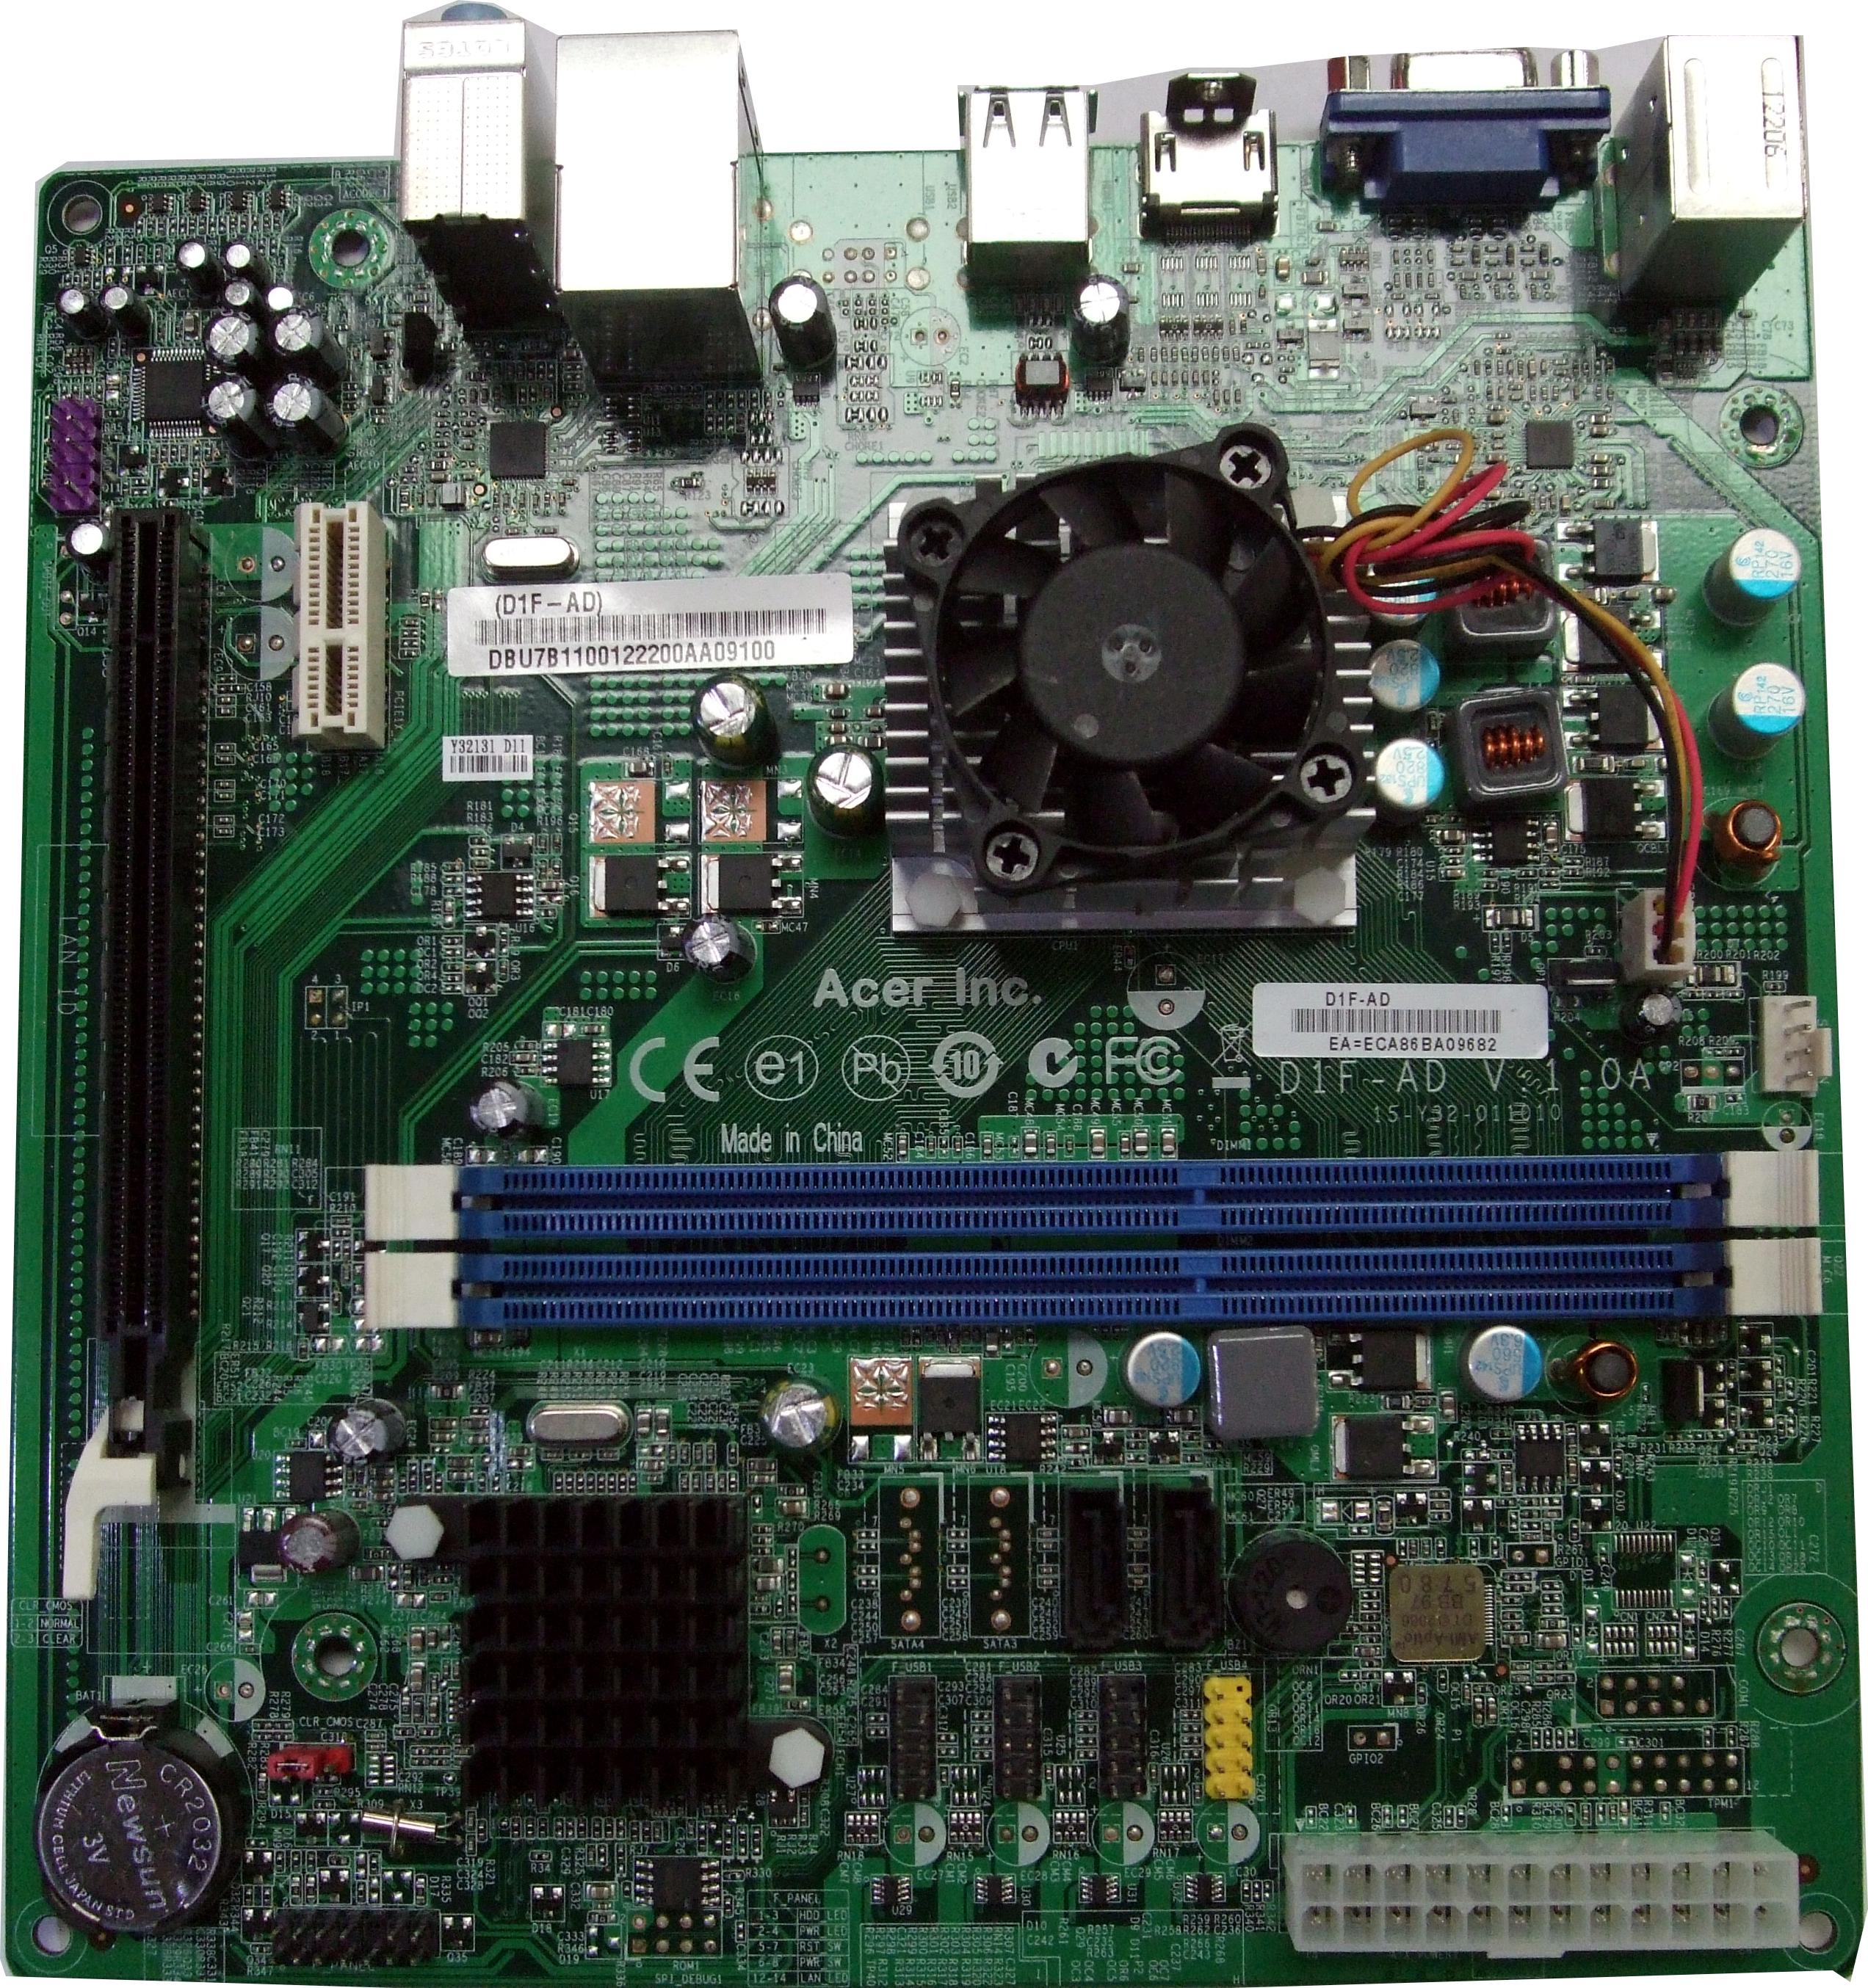 Acer Aspire X1430 X1430G W AMD E-300 1.65Ghz Cpu D1F-AD MB.SHU07.001 Motherboard